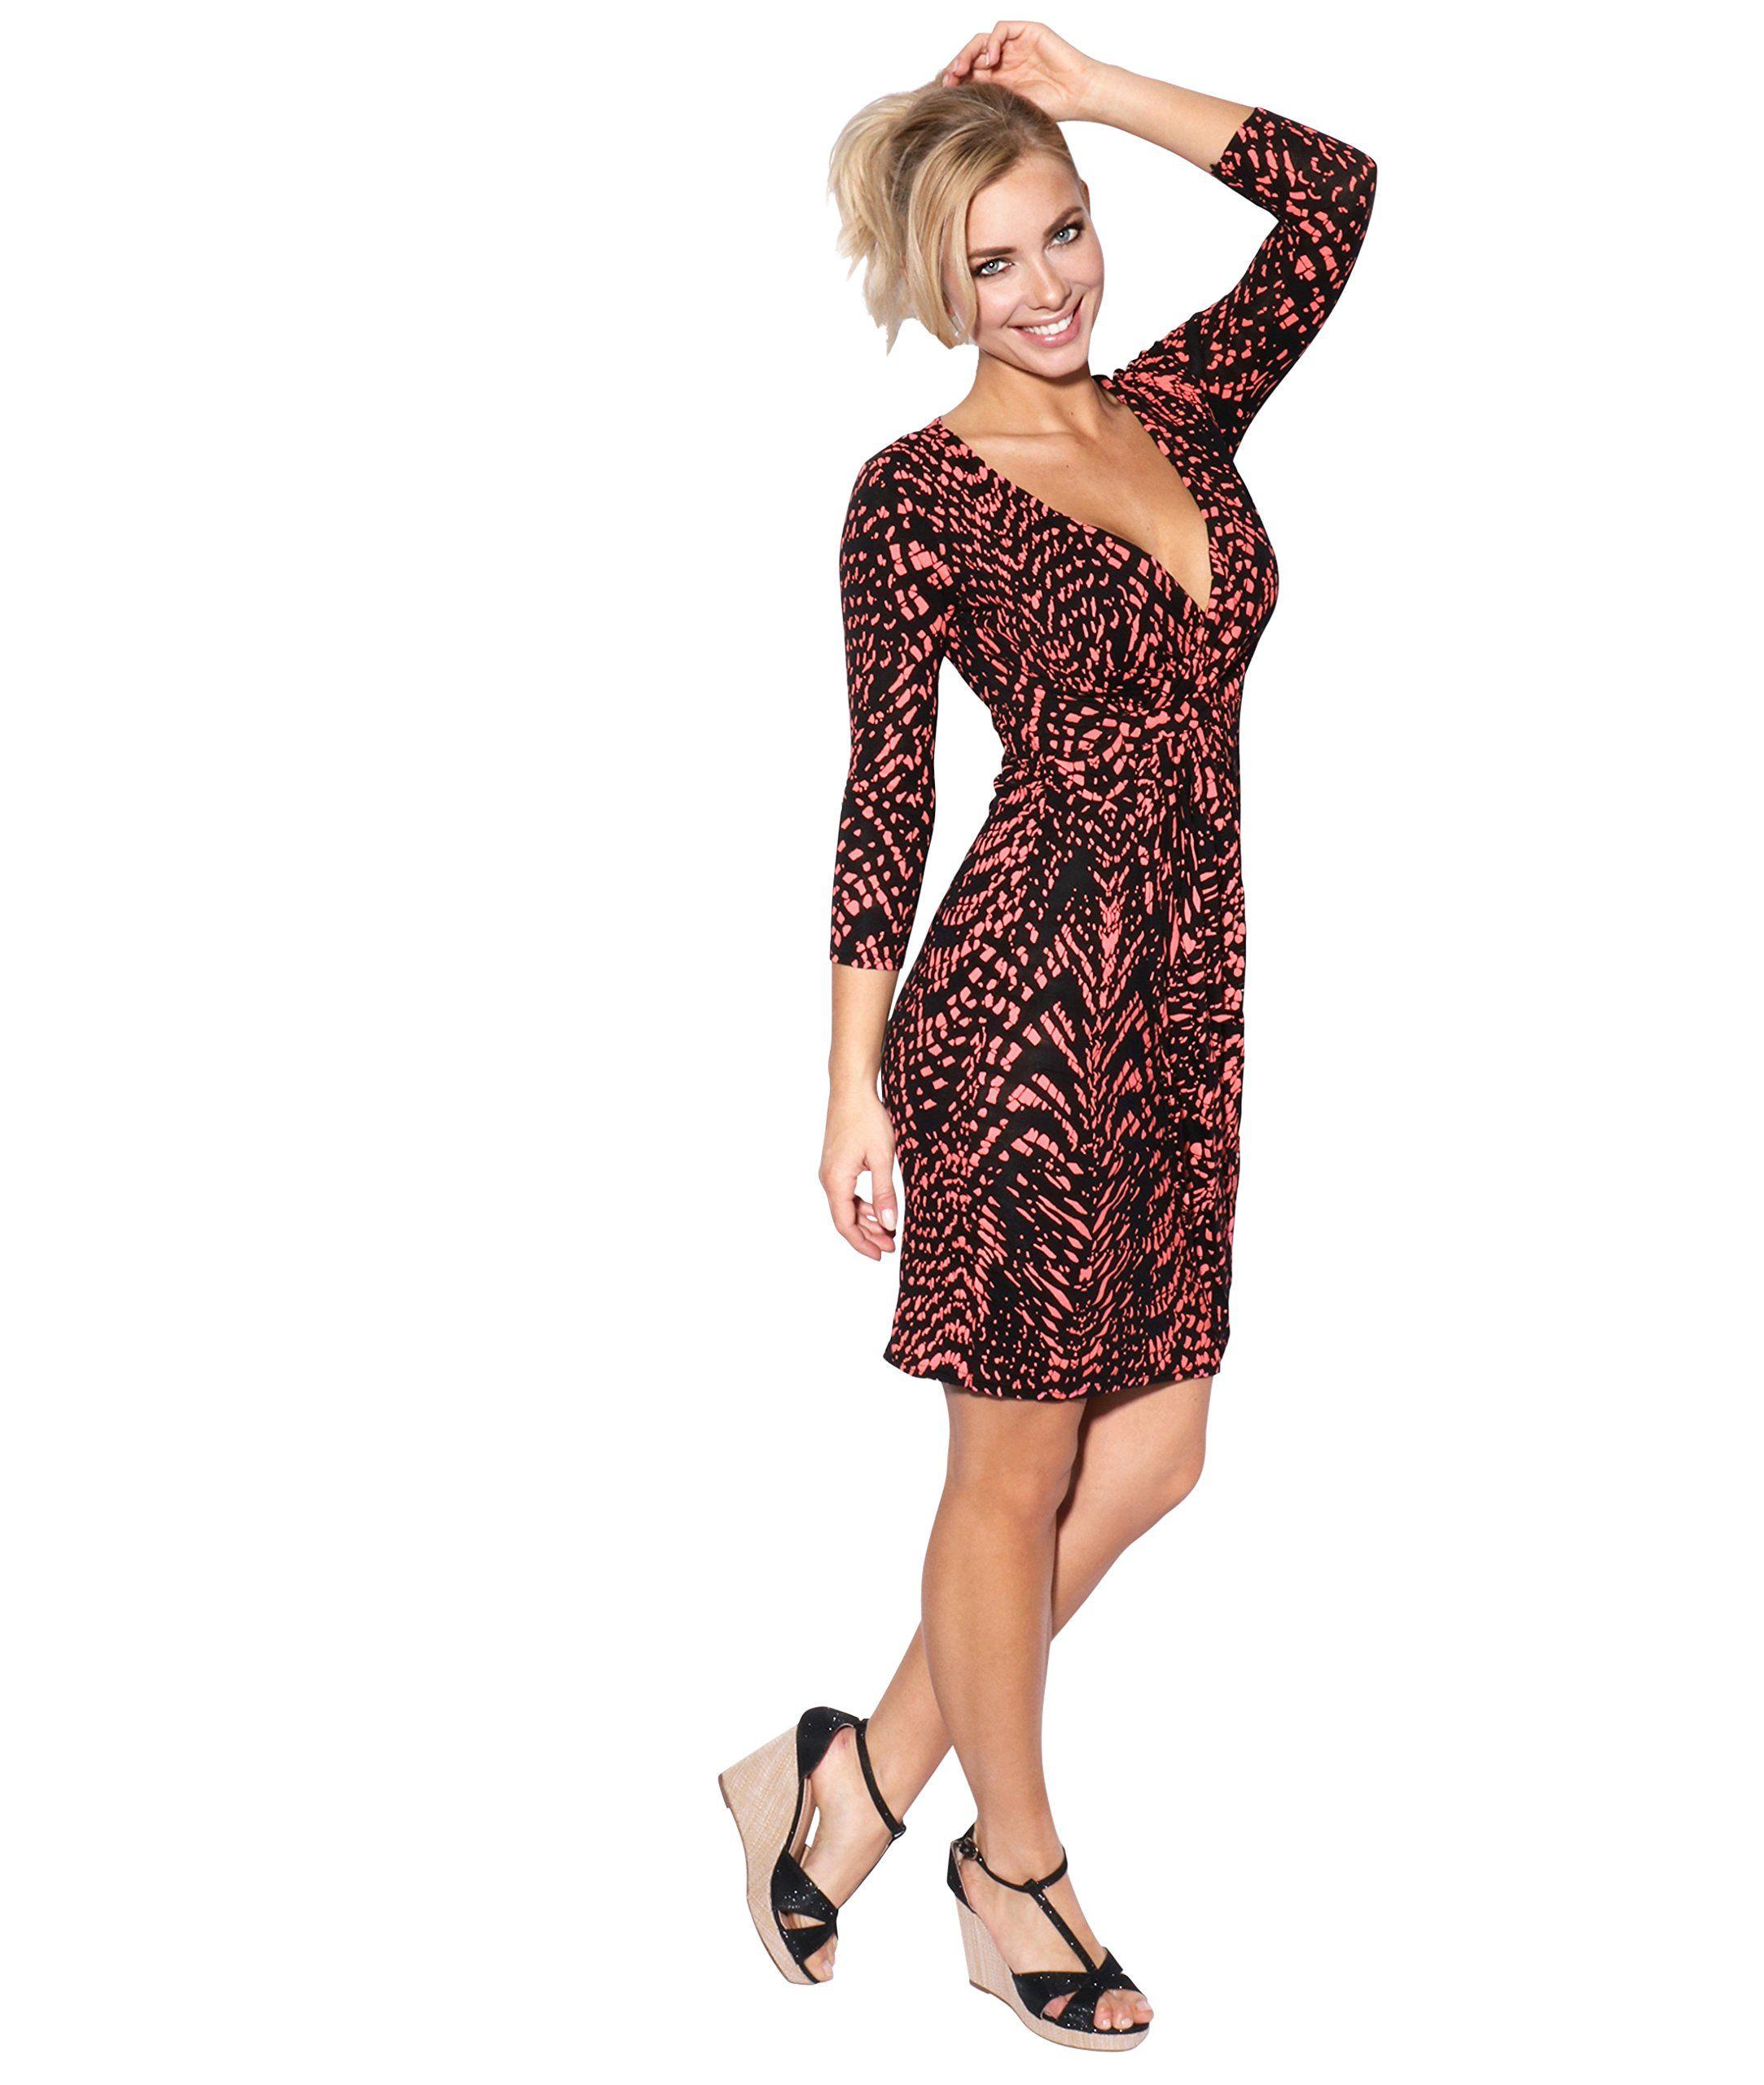 Krisp Womens Knee Length Wrap Dress 3 4 Sleeve Jersey Midi 8 Coral Black Click Image To Review More Details Note Amazon Fashion Midi Wrap Dress Wrap Dress [ 2560 x 2166 Pixel ]